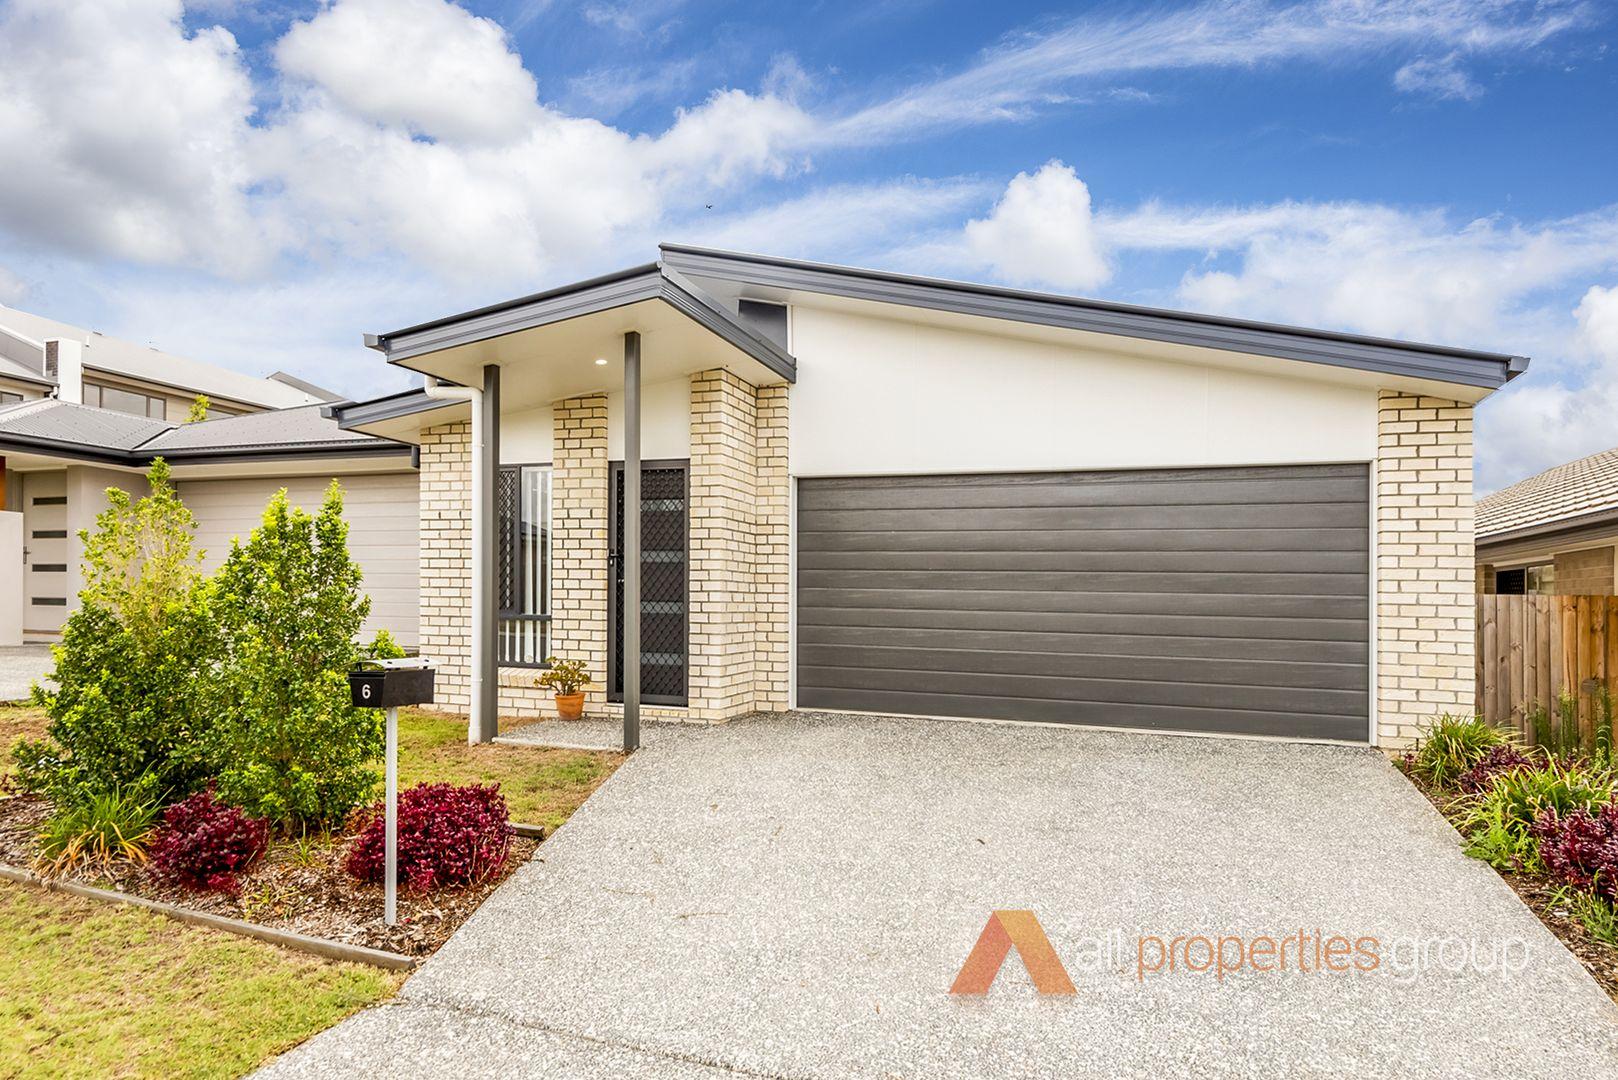 6 Breccia Street, Yarrabilba QLD 4207, Image 0